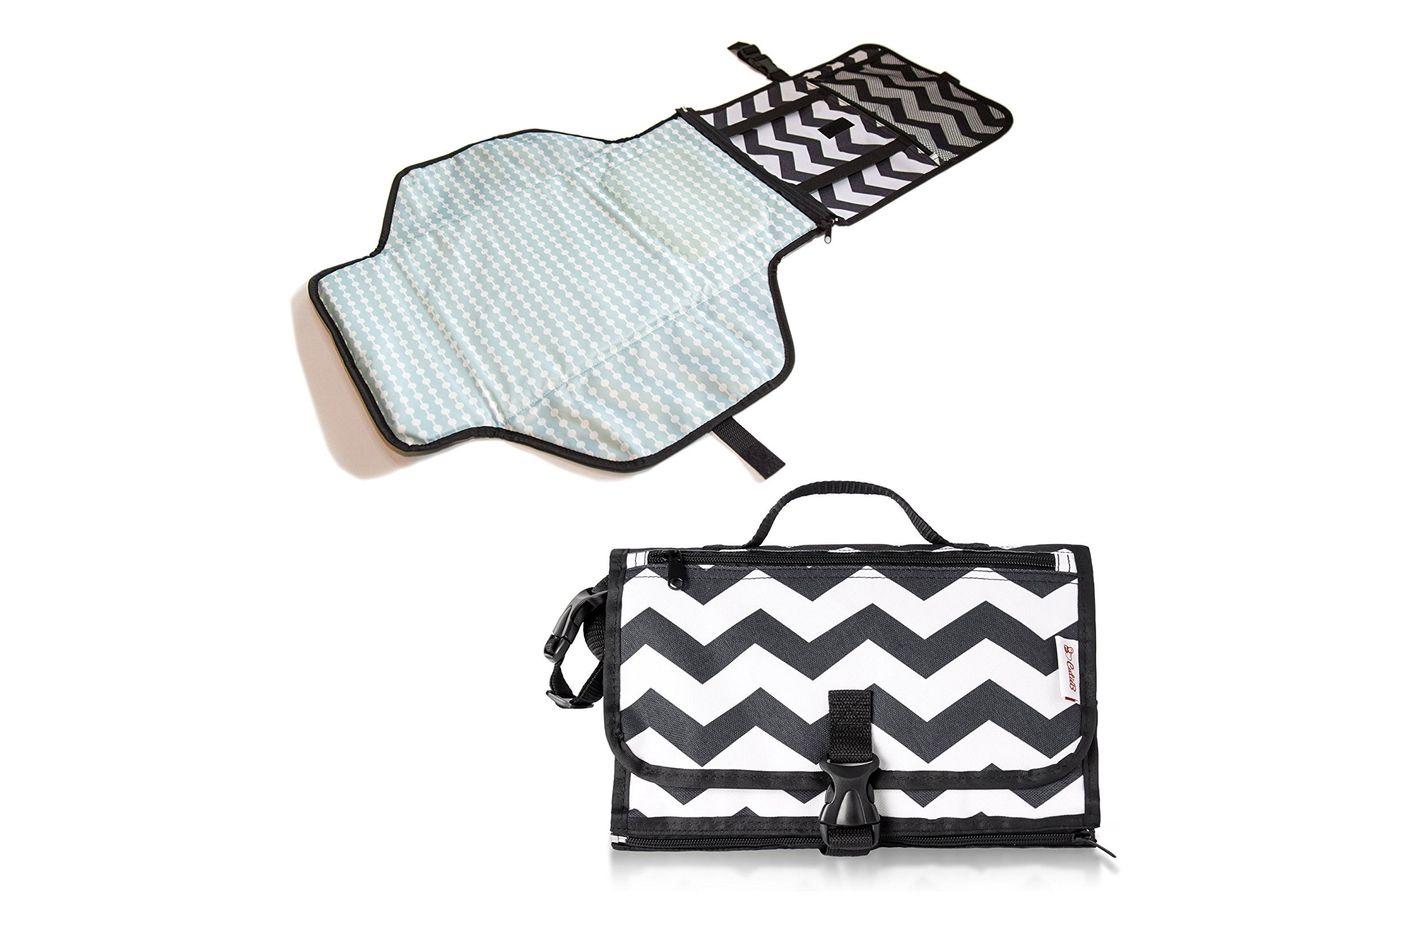 CutieB Portable Changing Cushion